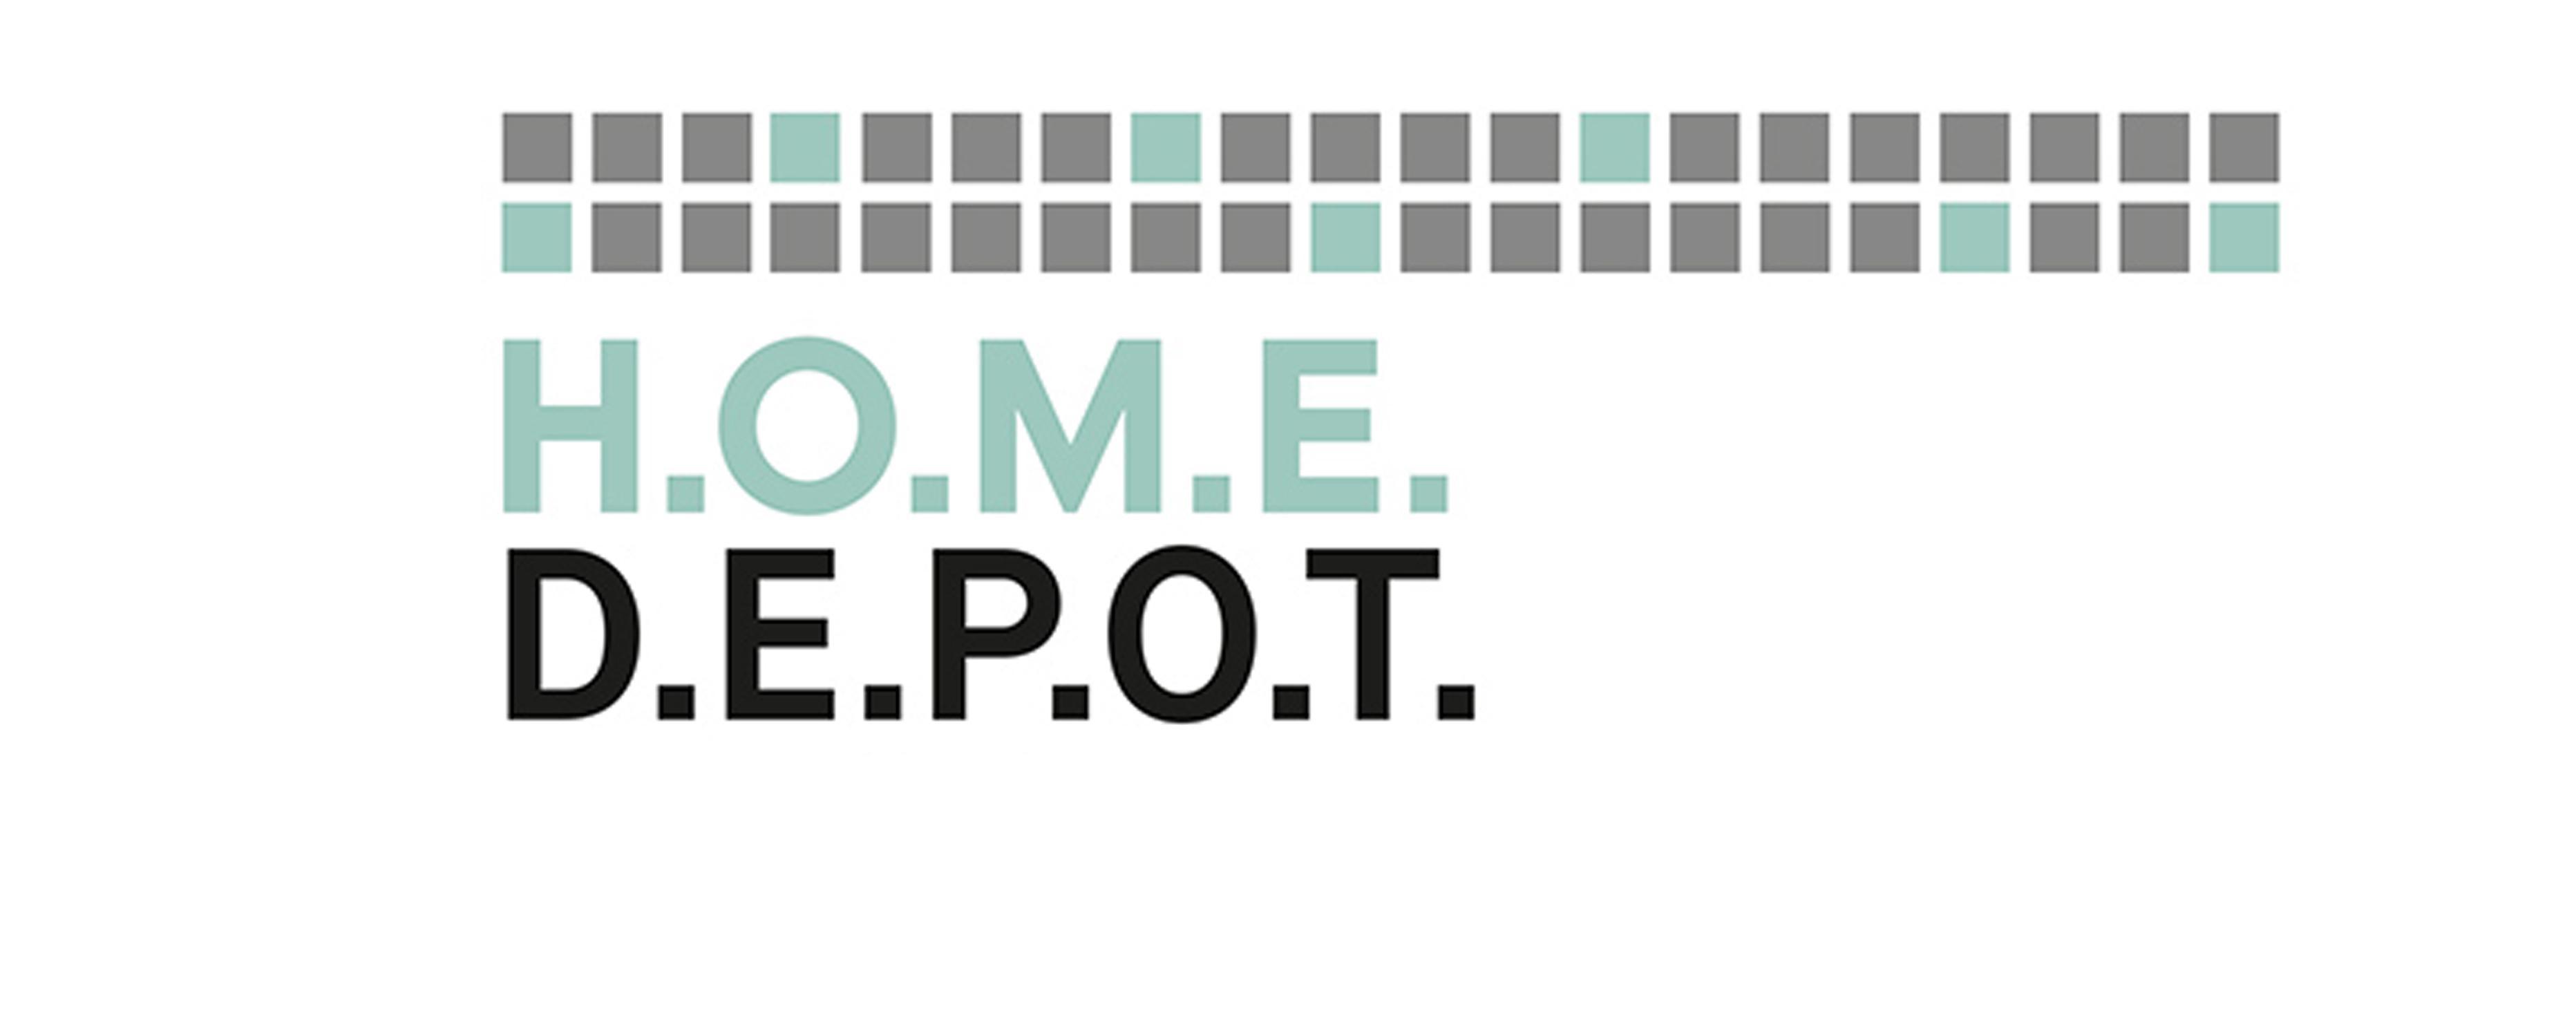 HOME Depot 2017 Ligne Roset